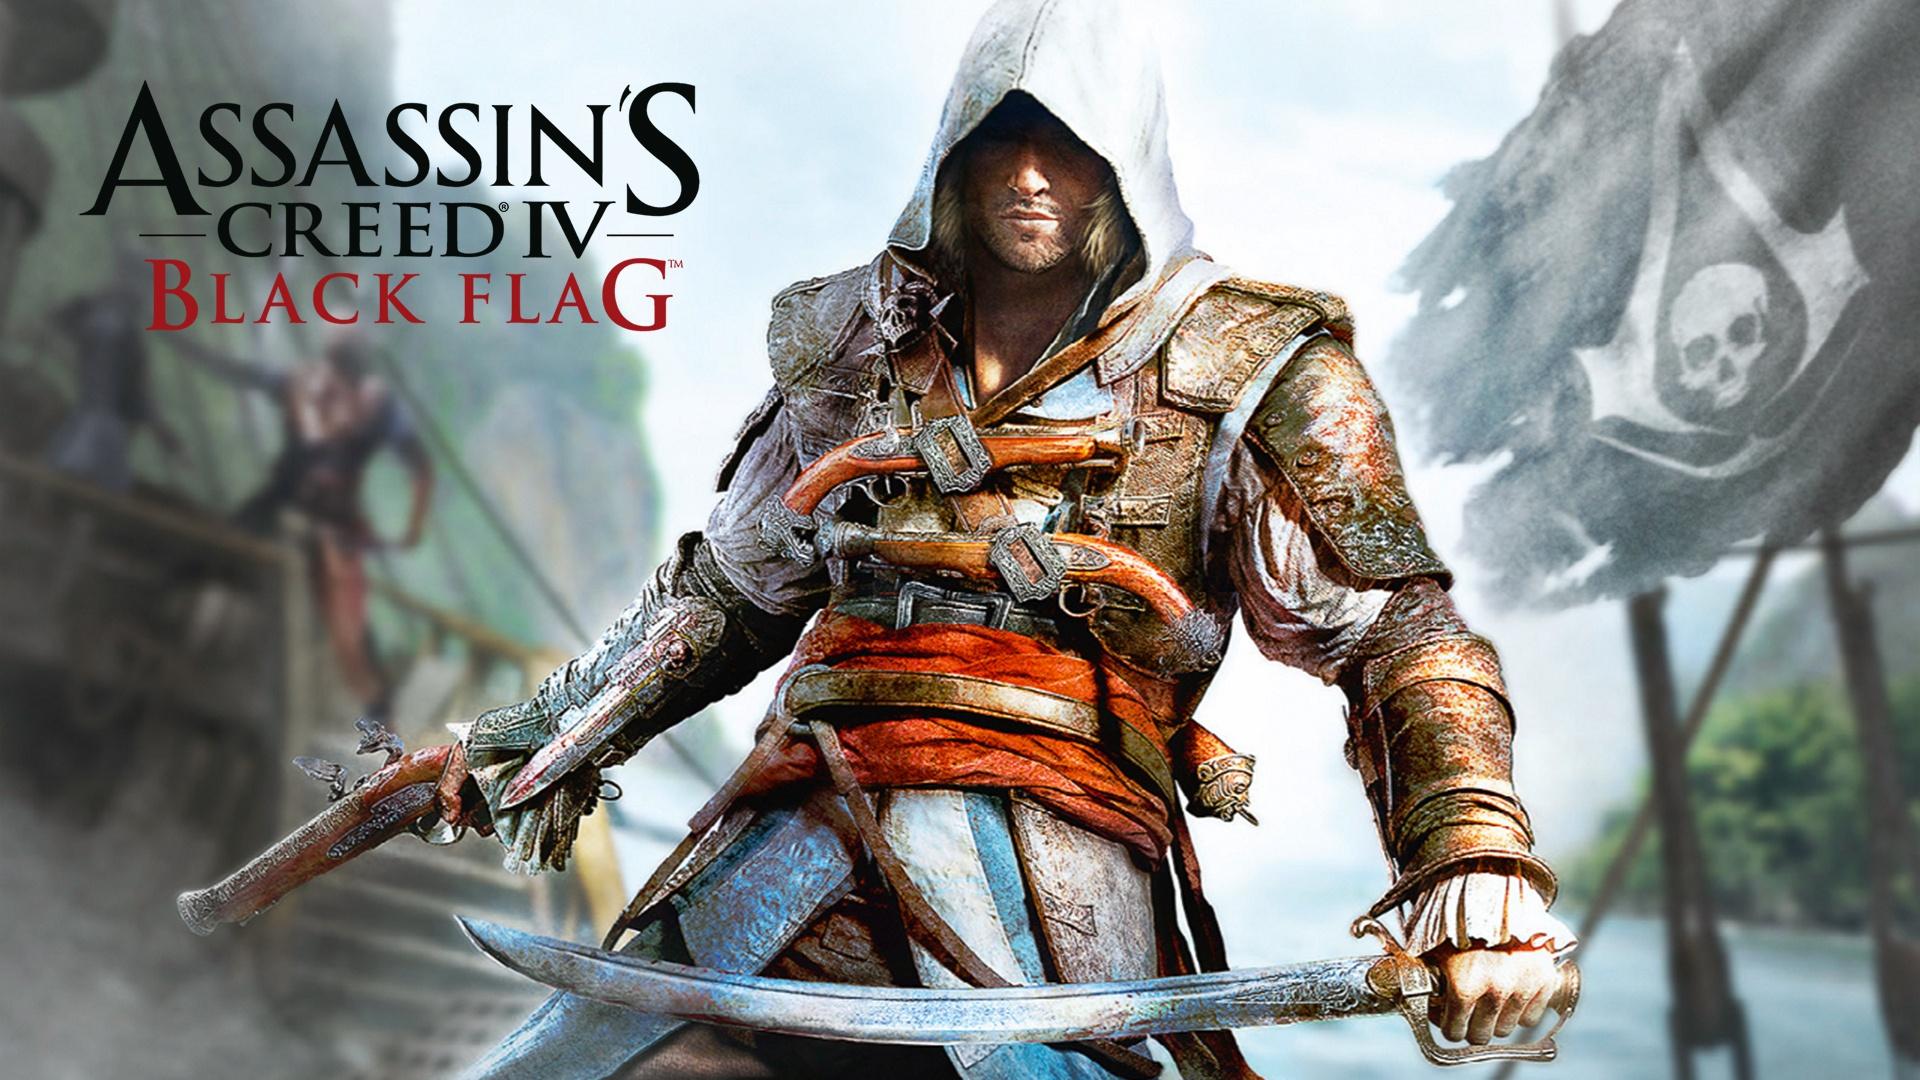 Free Download Assassins Creed Black Flag Wallpaper Hd 1080p